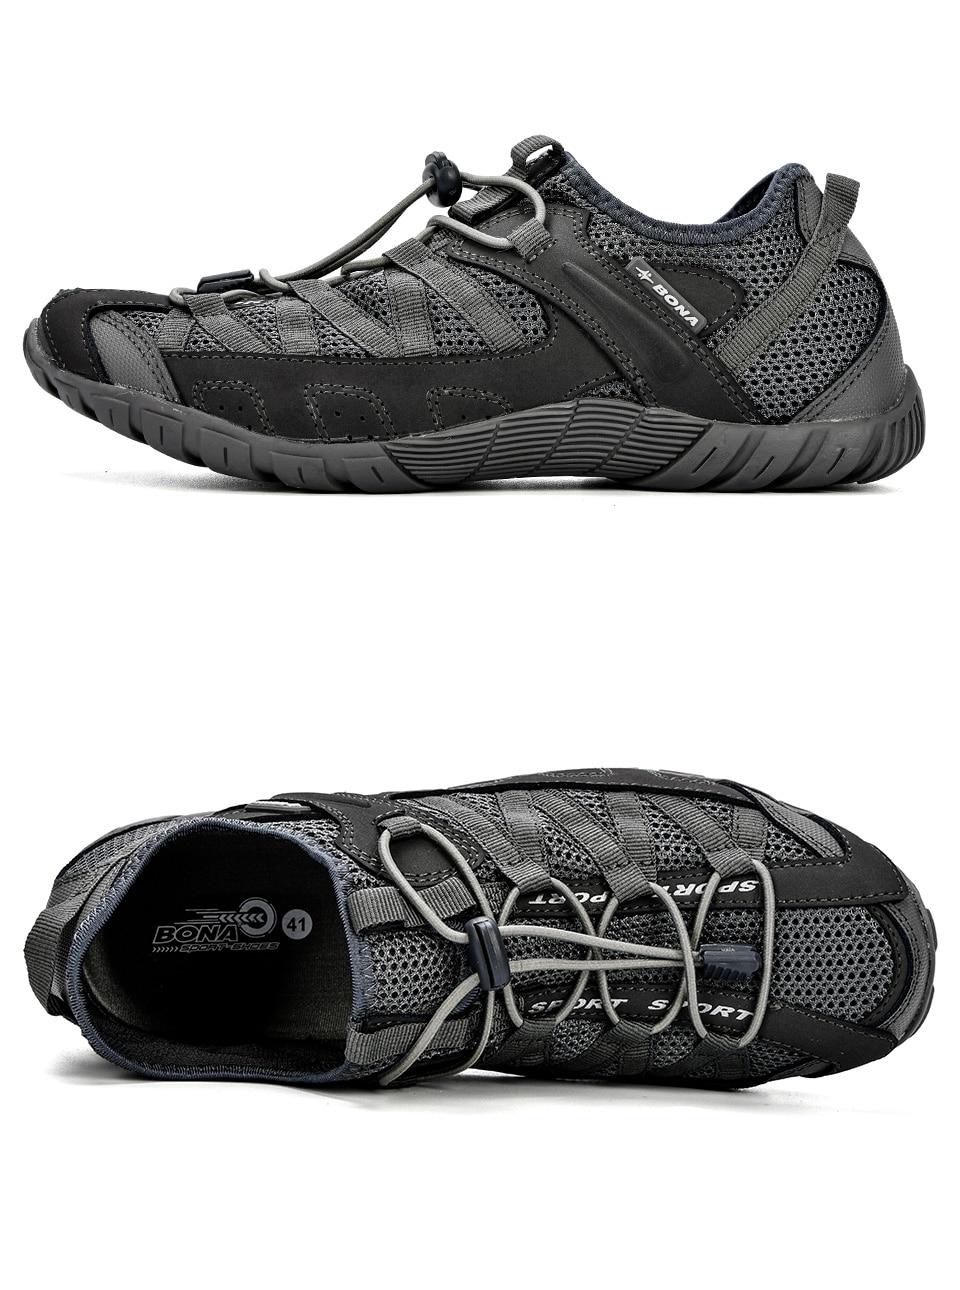 HTB1qaGPKb1YBuNjSszeq6yblFXa0 BONA 2018 Summer Sneakers Breathable Men Casual Shoes Fashion Men Shoes Tenis Masculino Adulto Sapato Masculino Men Leisure Shoe